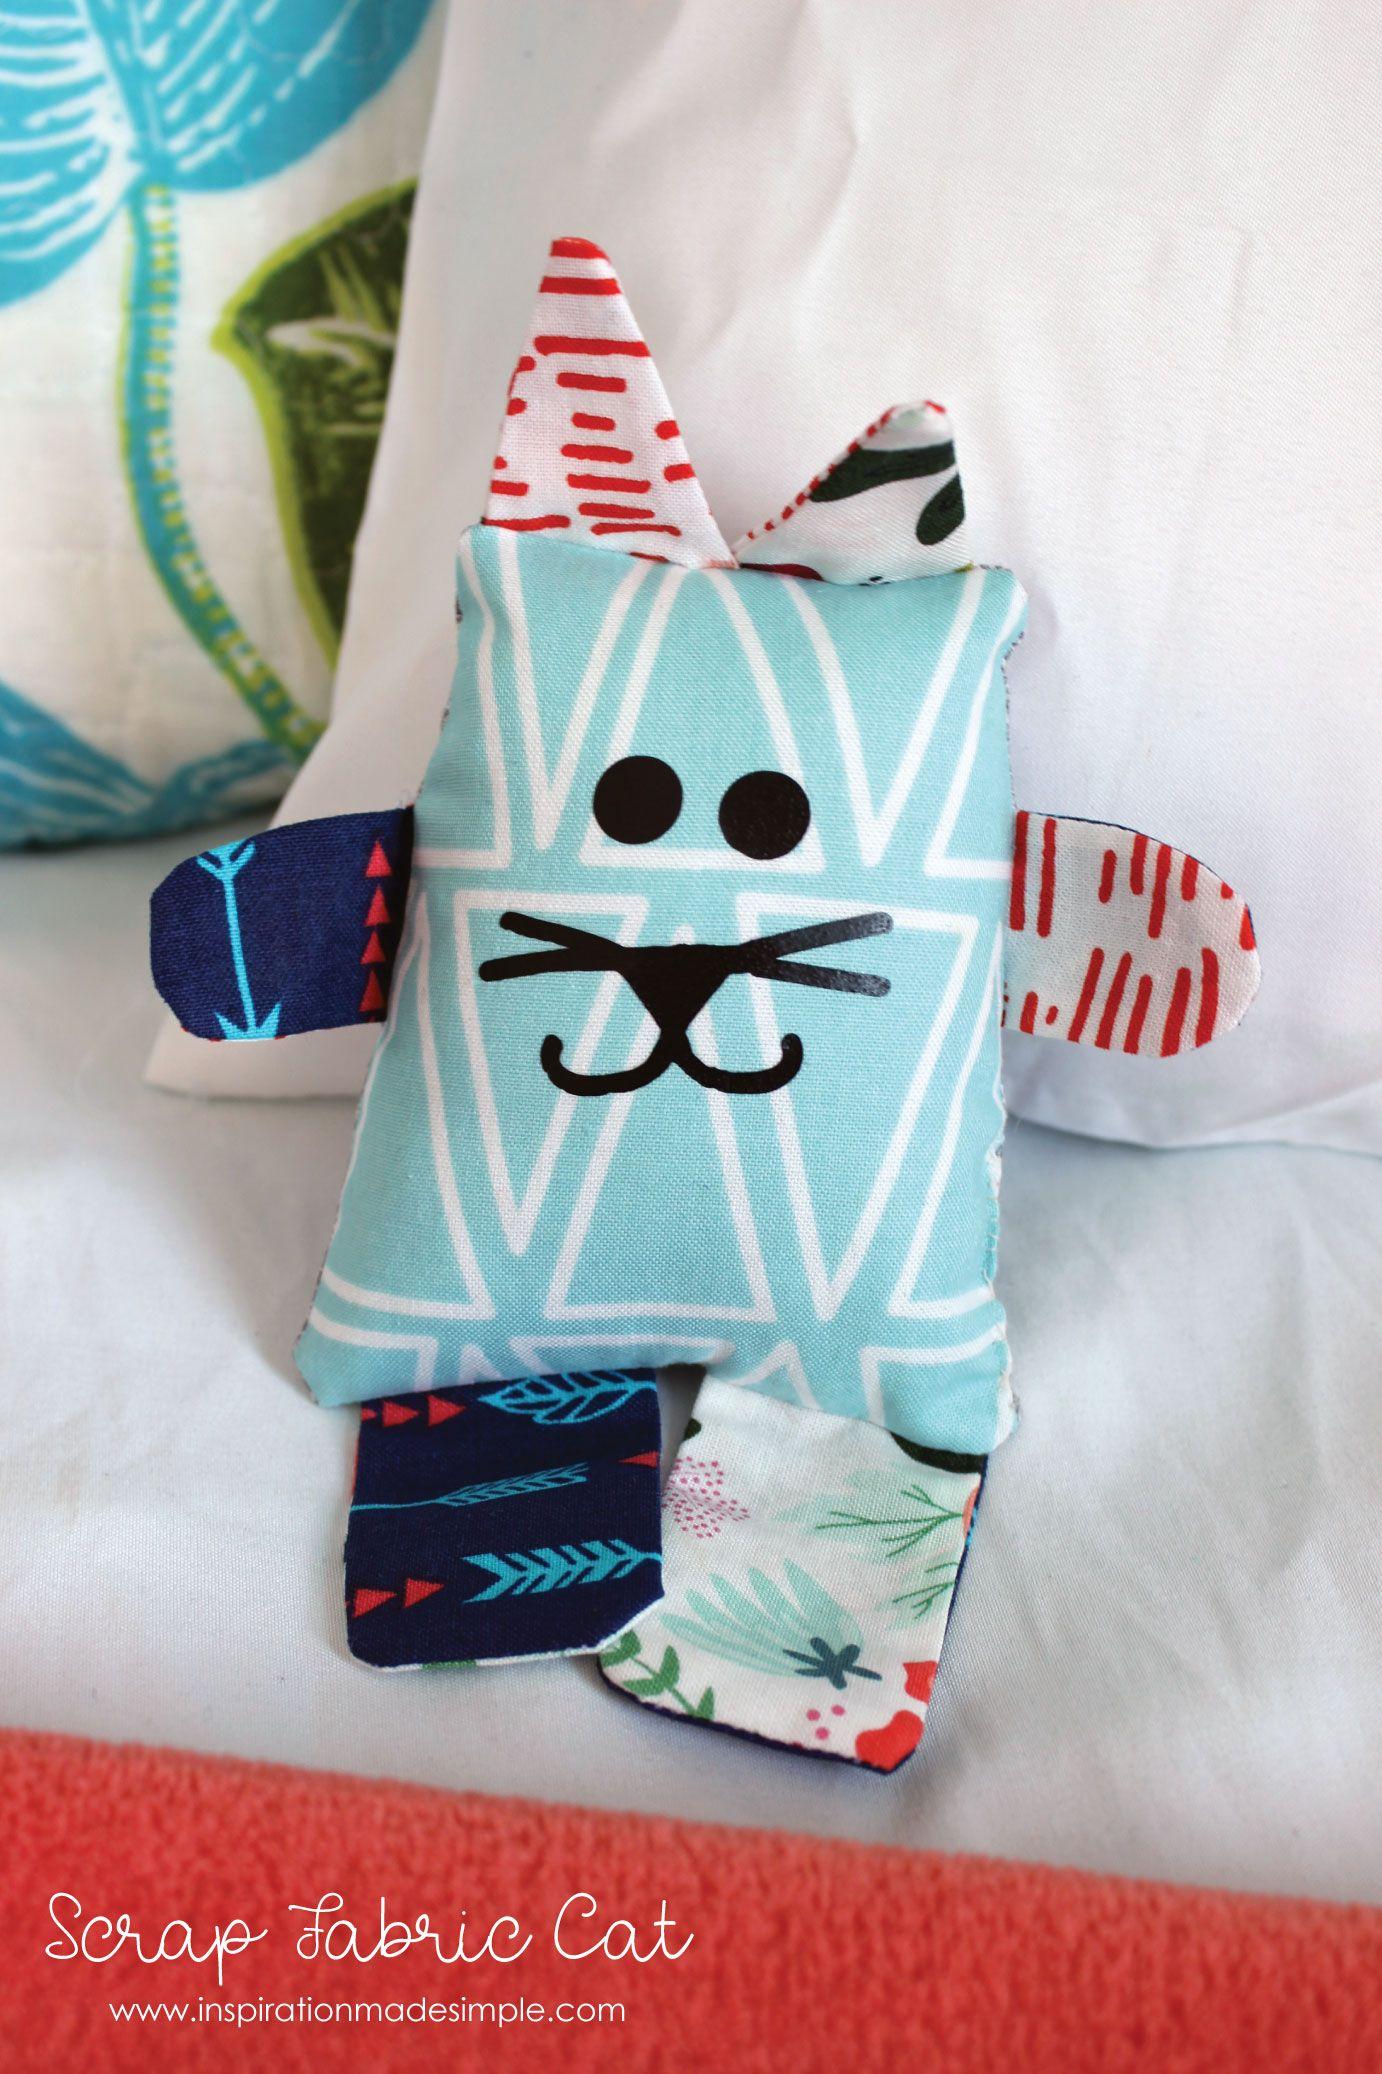 DIY Scrap Fabric Cat - Inspiration Made Simple #scrapfabric